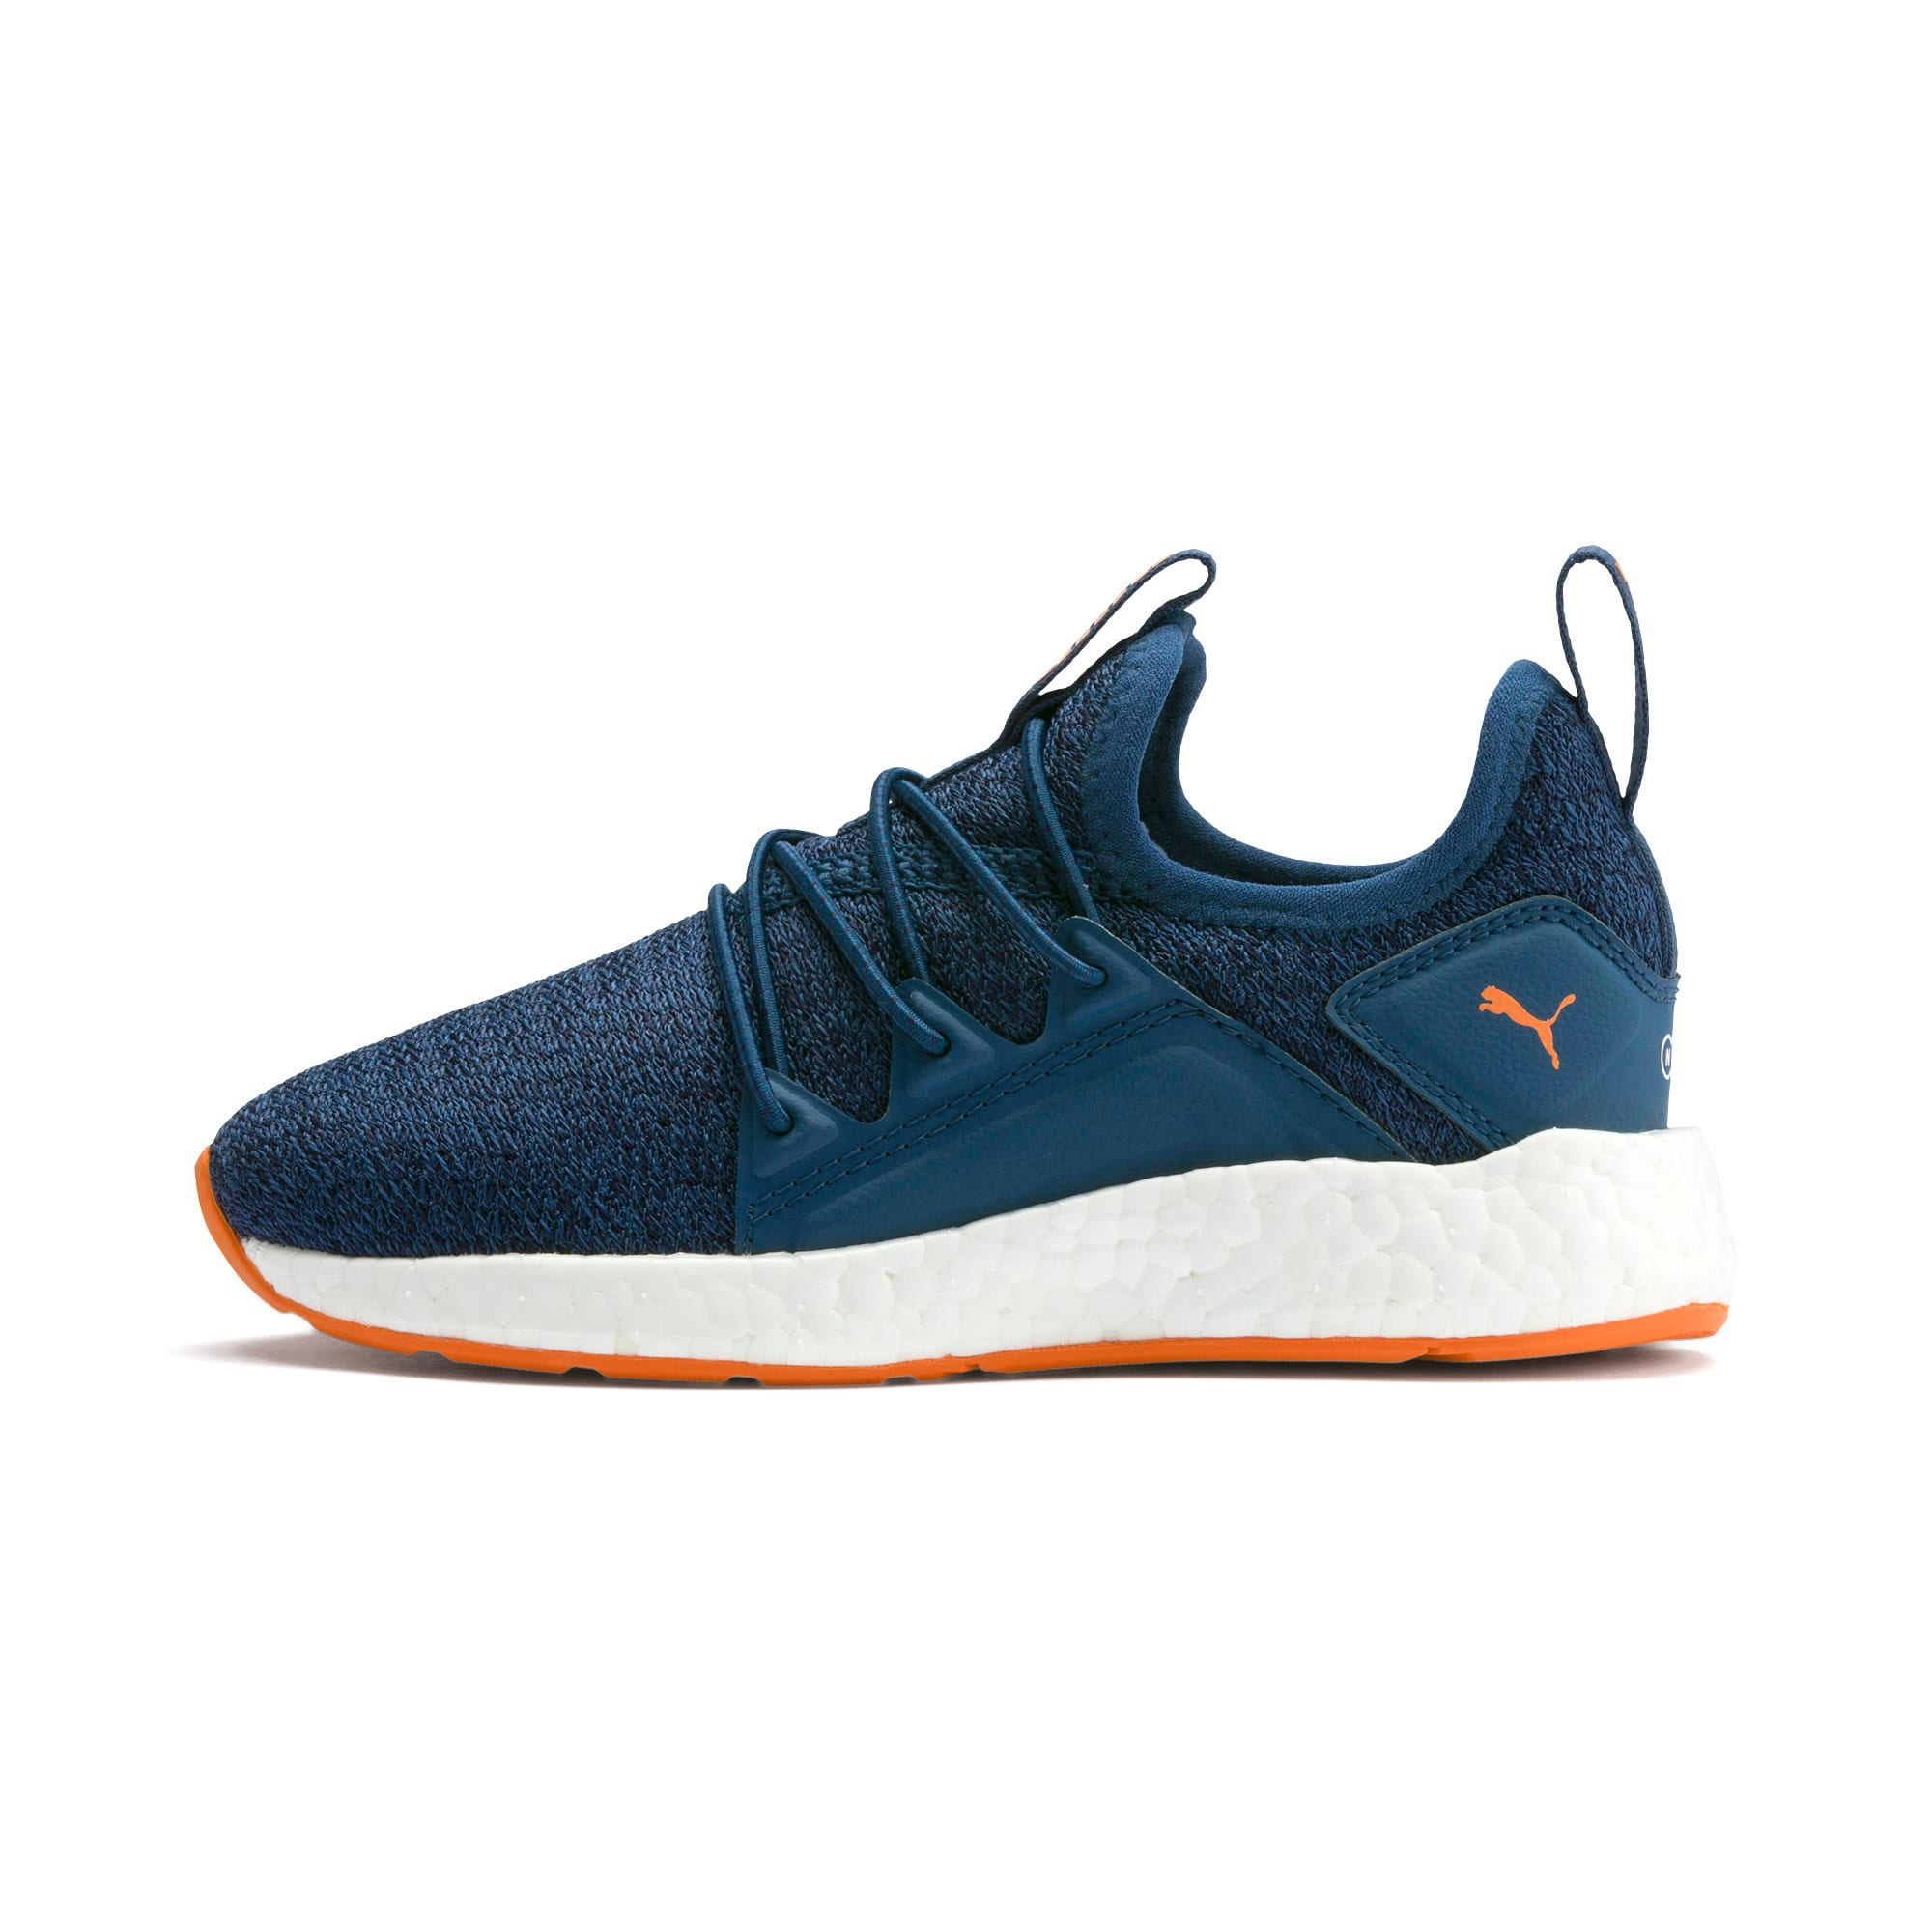 Miniatura 1 de Zapatos de punto NRGY Neko para PS, G Sea-Peacoat-J Orange-White, mediano